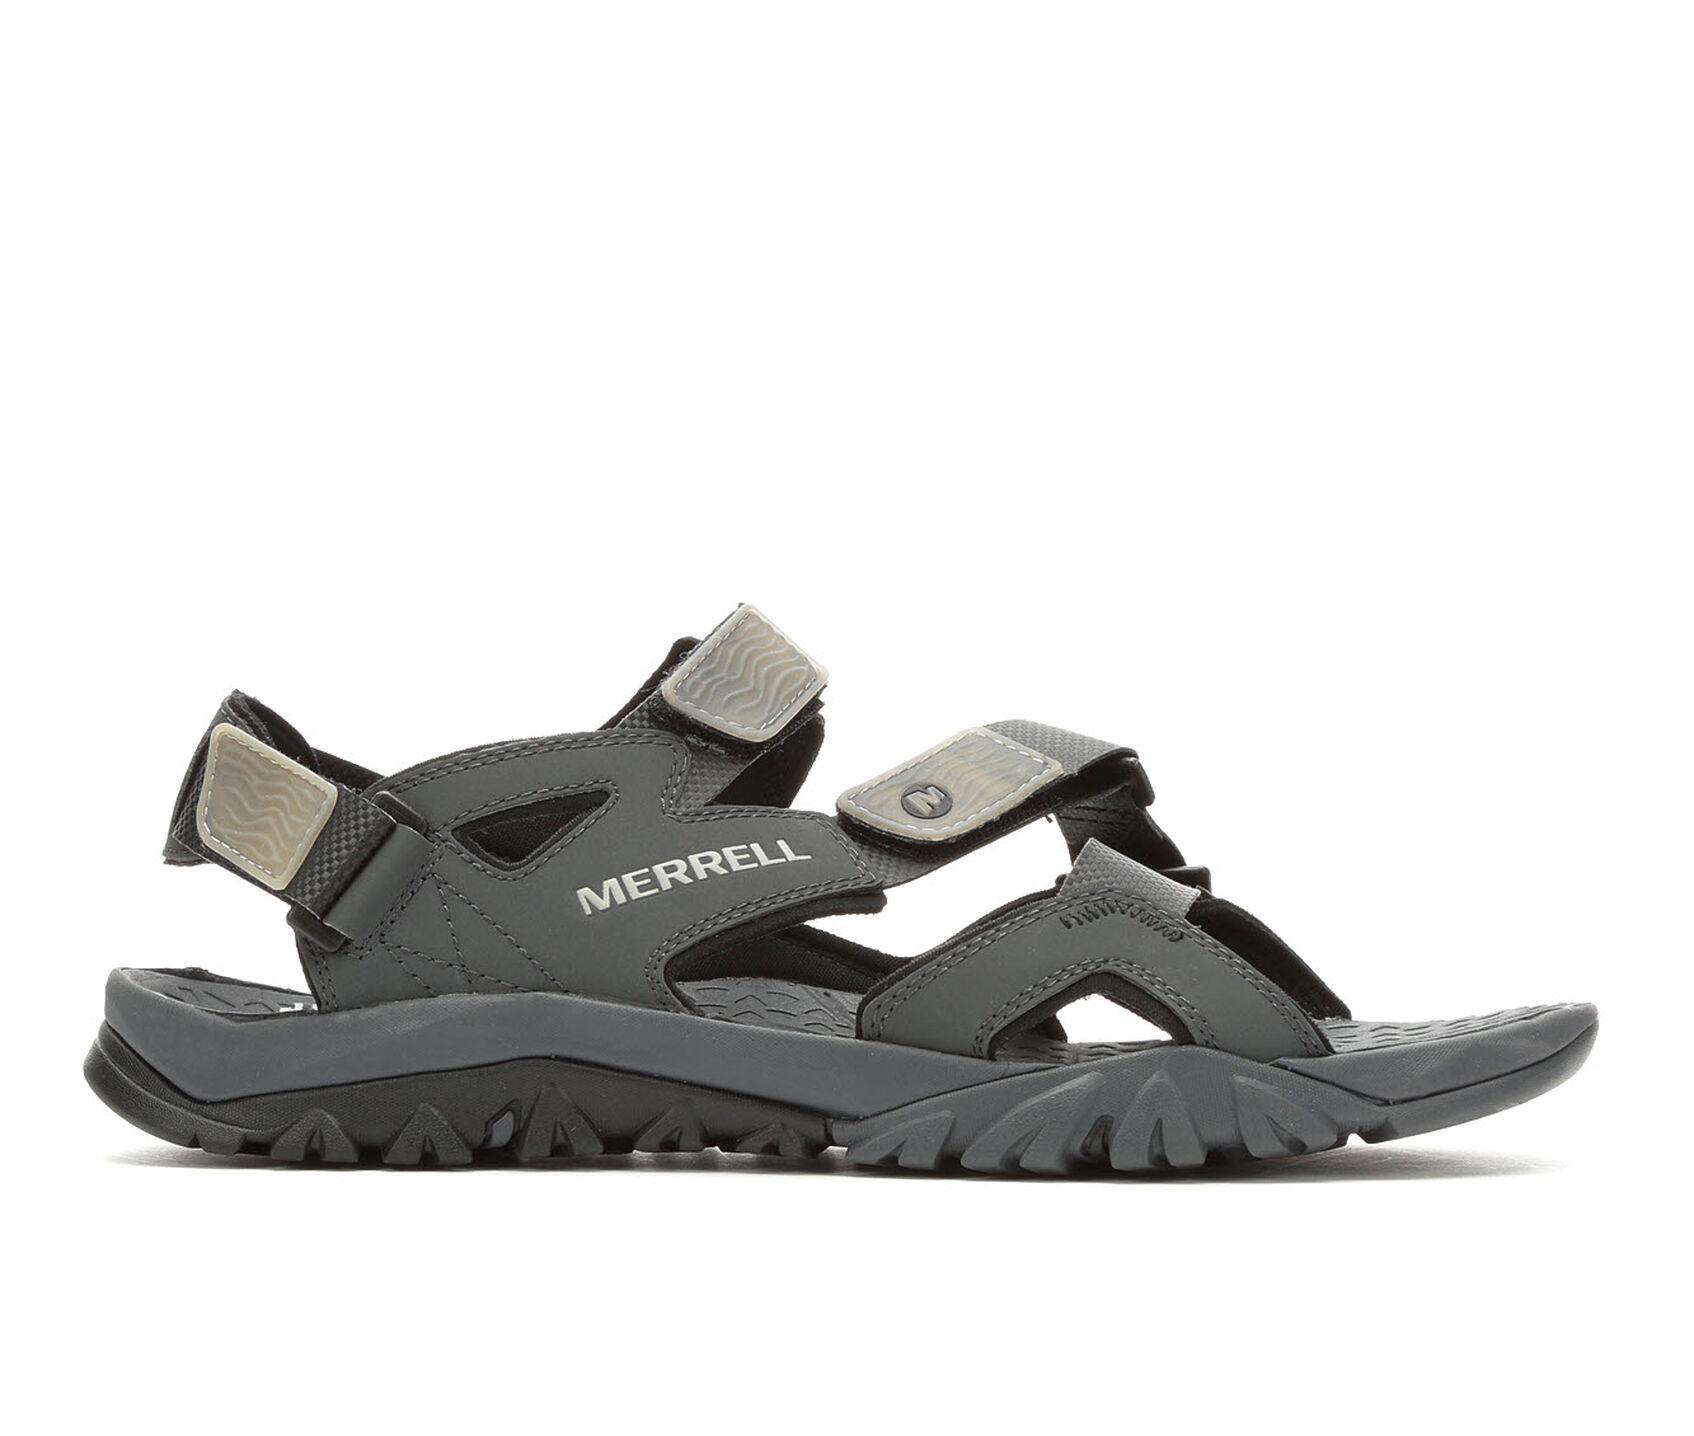 0bceee381fdd ... Merrell Tetrex Crest Strap Hiking Sandals. Previous